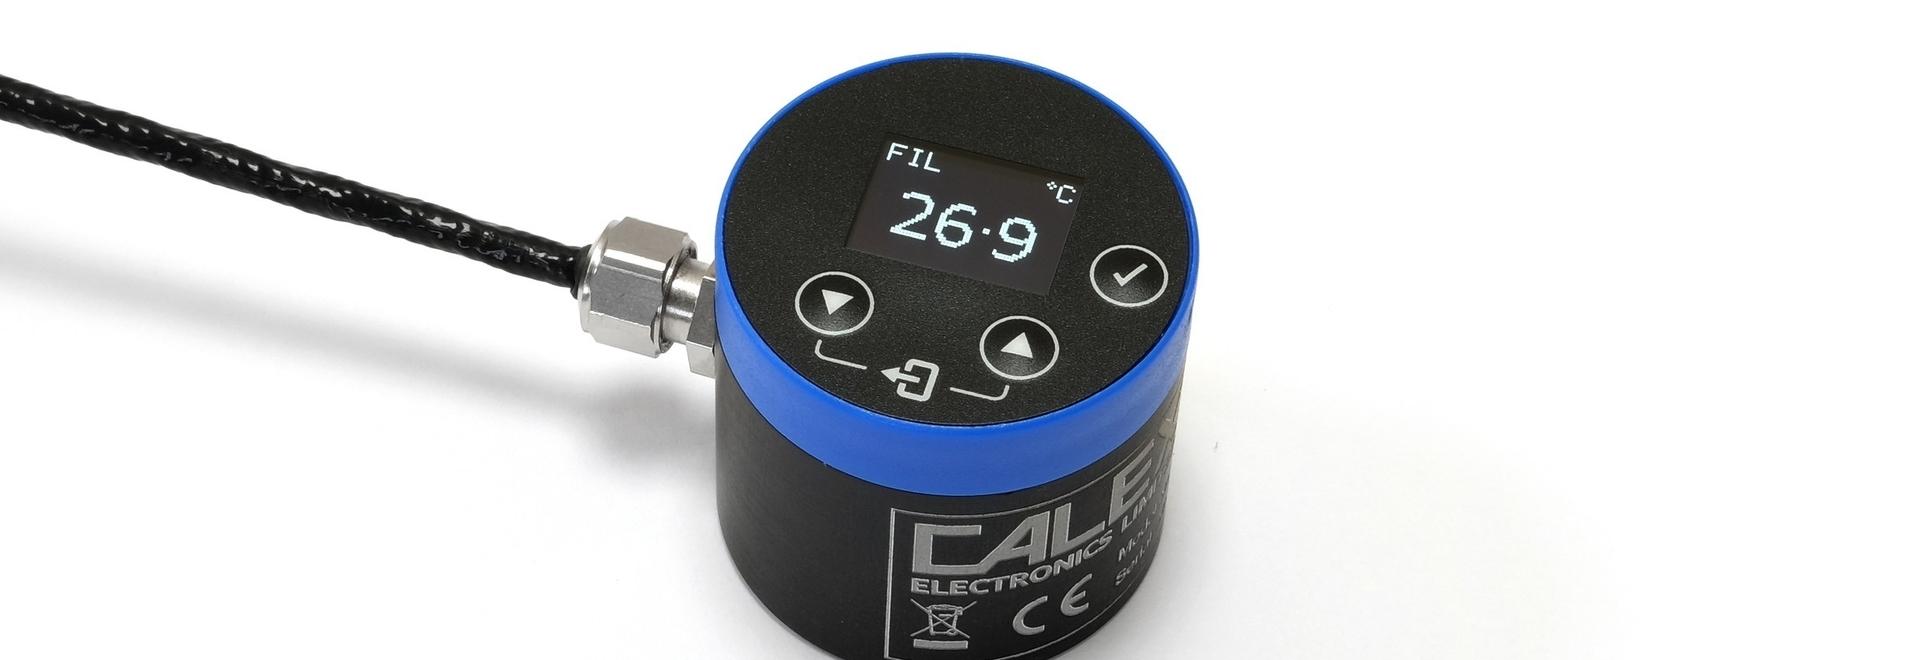 Calex PyroSigma infrared temperature sensor with built-in display